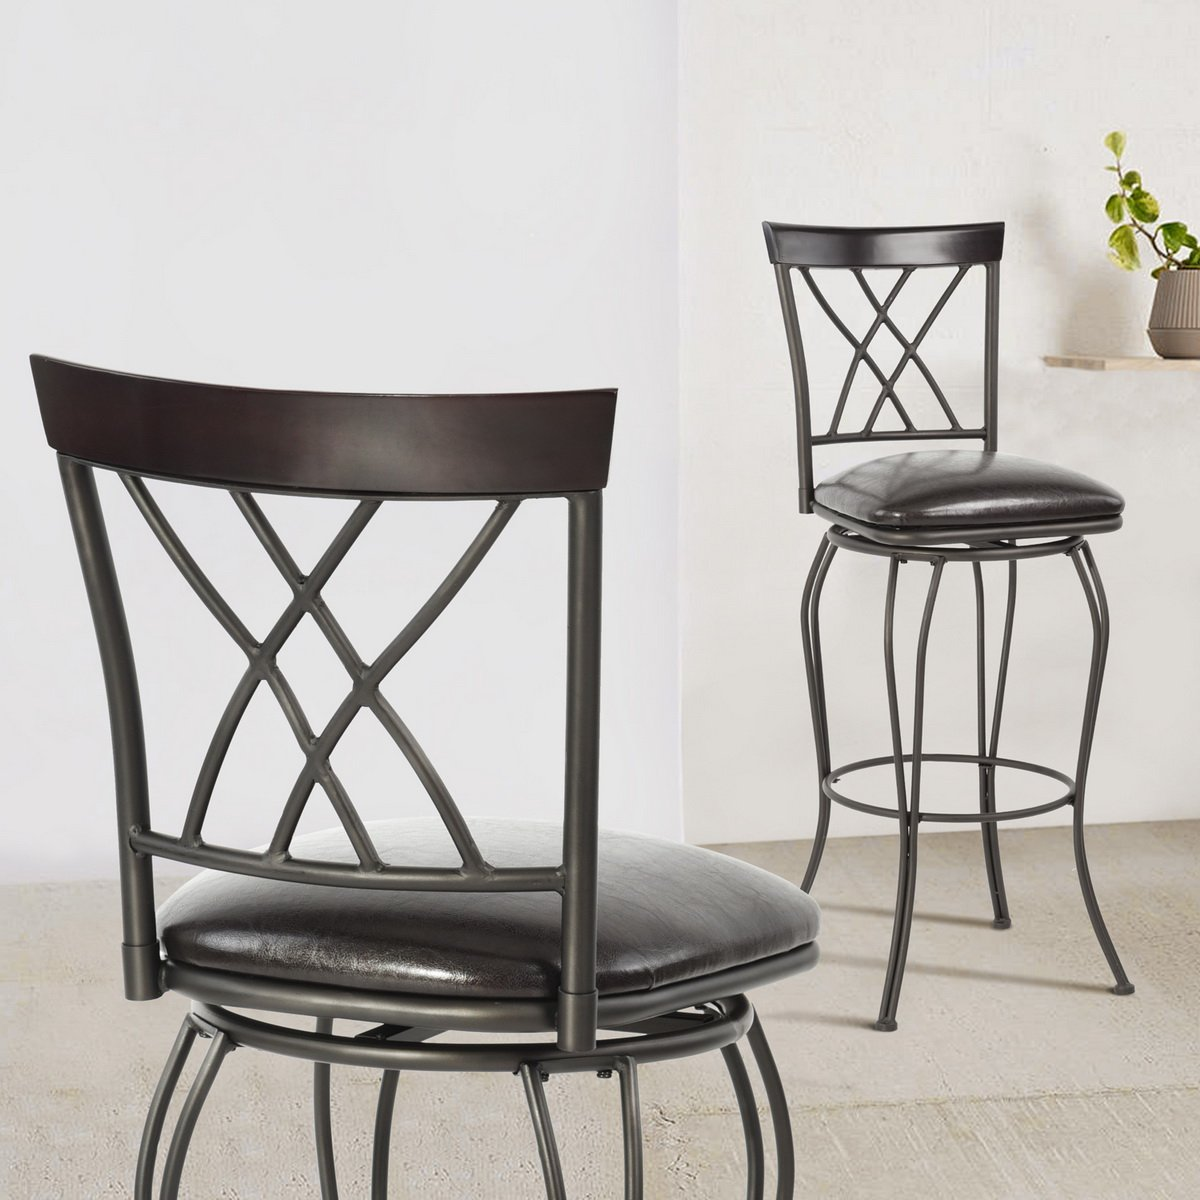 FurnitureR 24'' Circles-Back Swivel Bar stool Counter Height Bar Chair